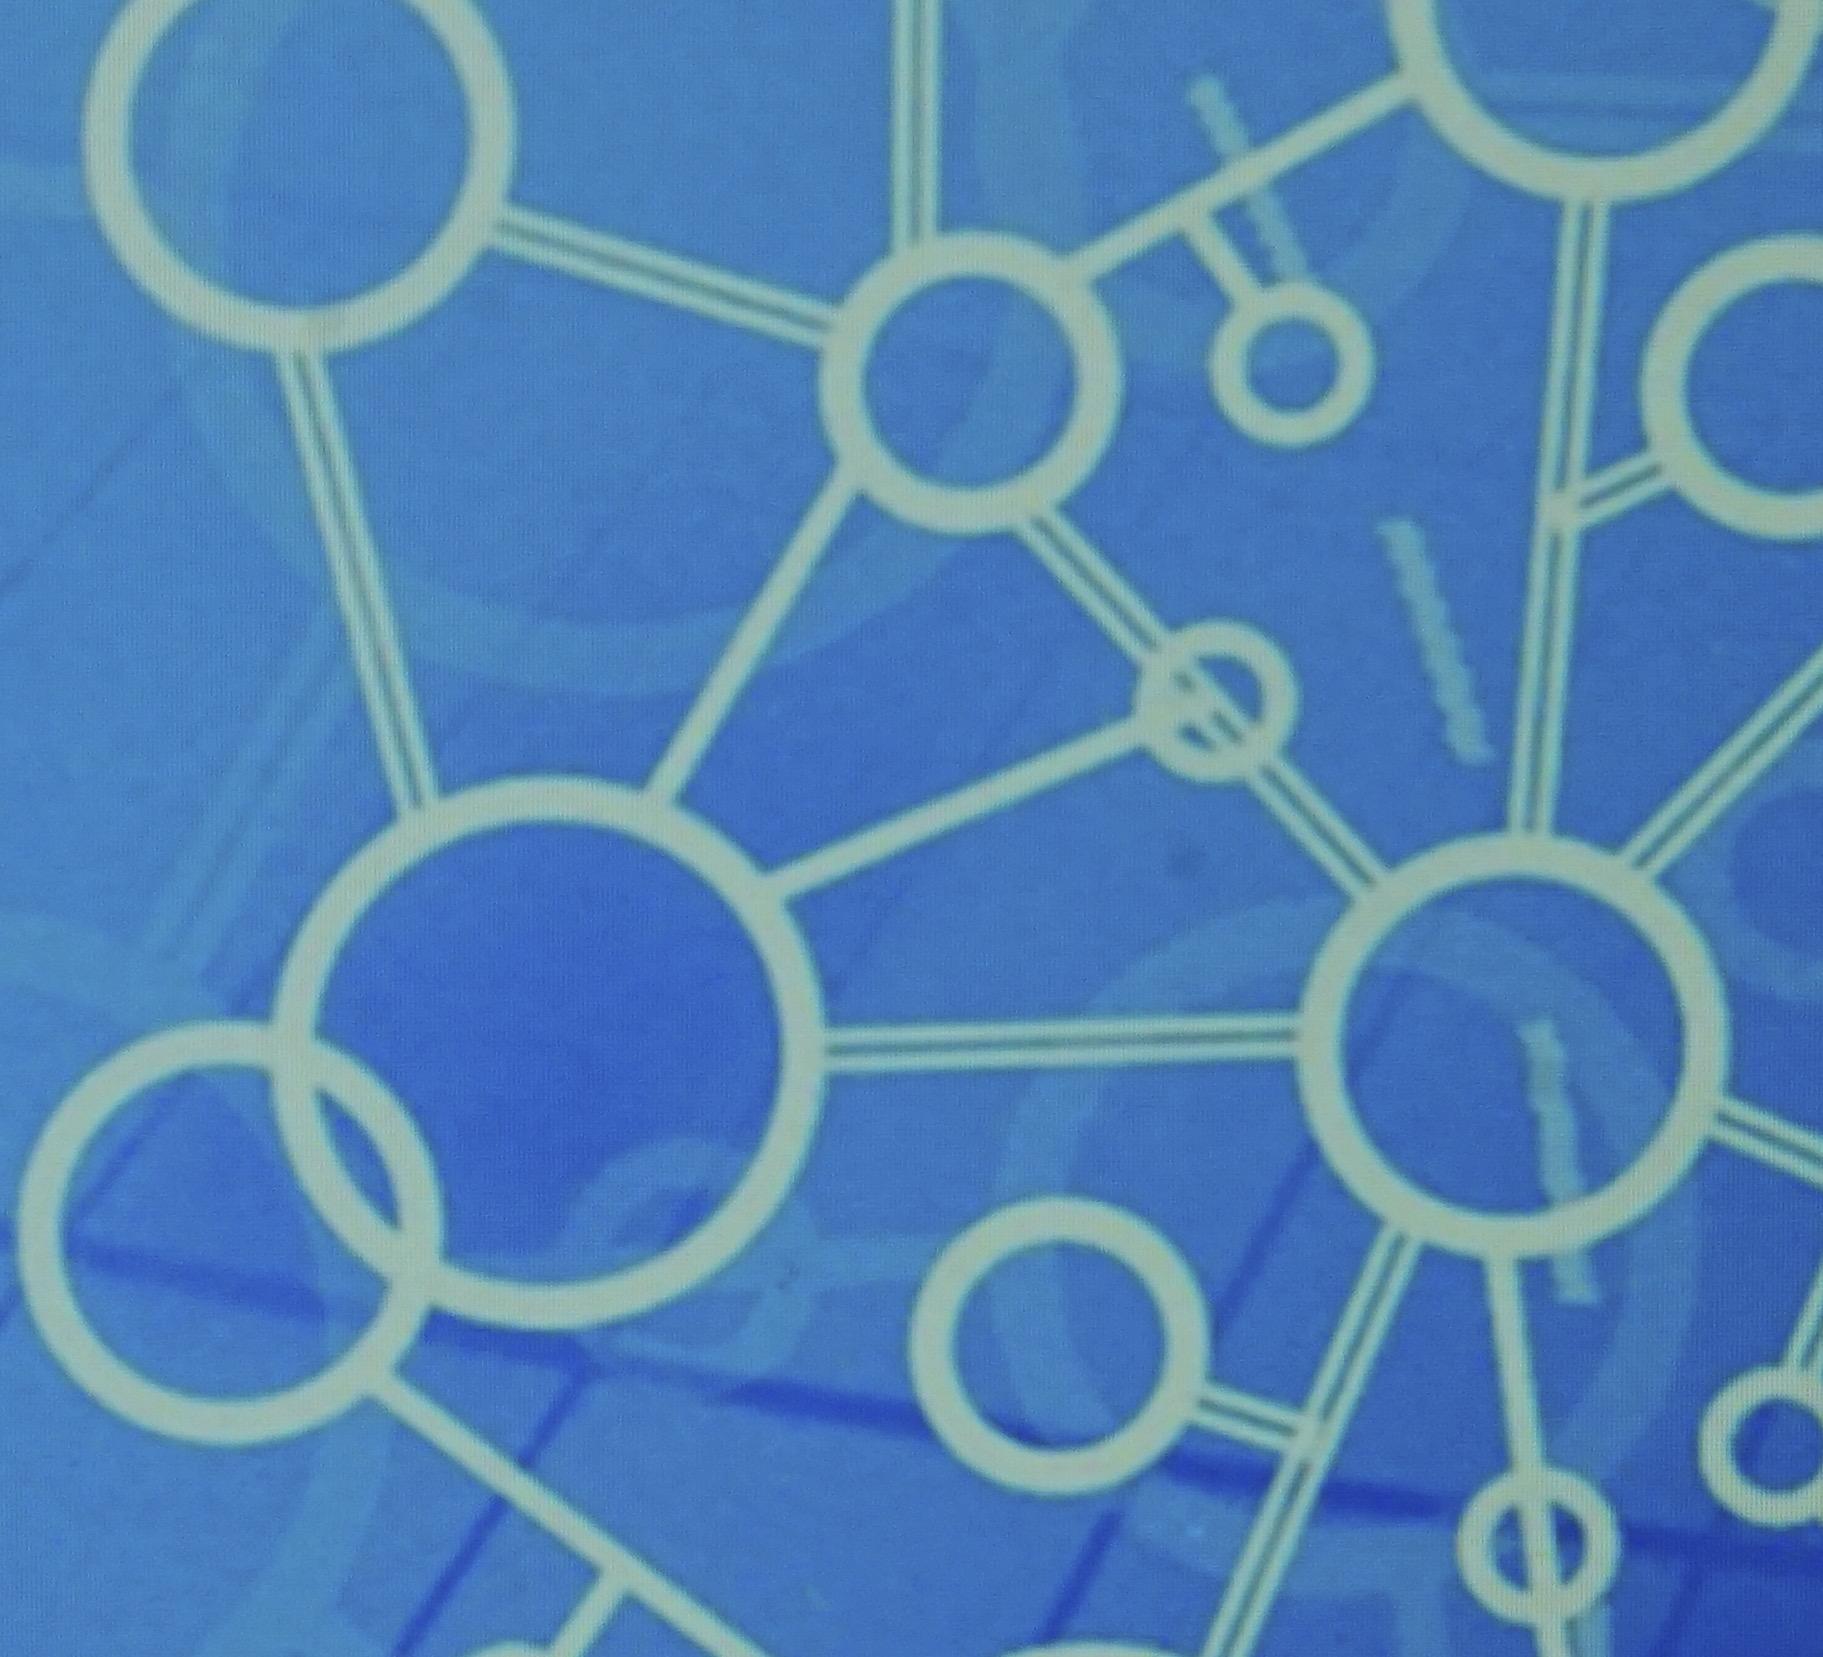 Models, Data & AI Workgroup- 19/10/2021 -18:00 CET - 5p.m. UK Time.